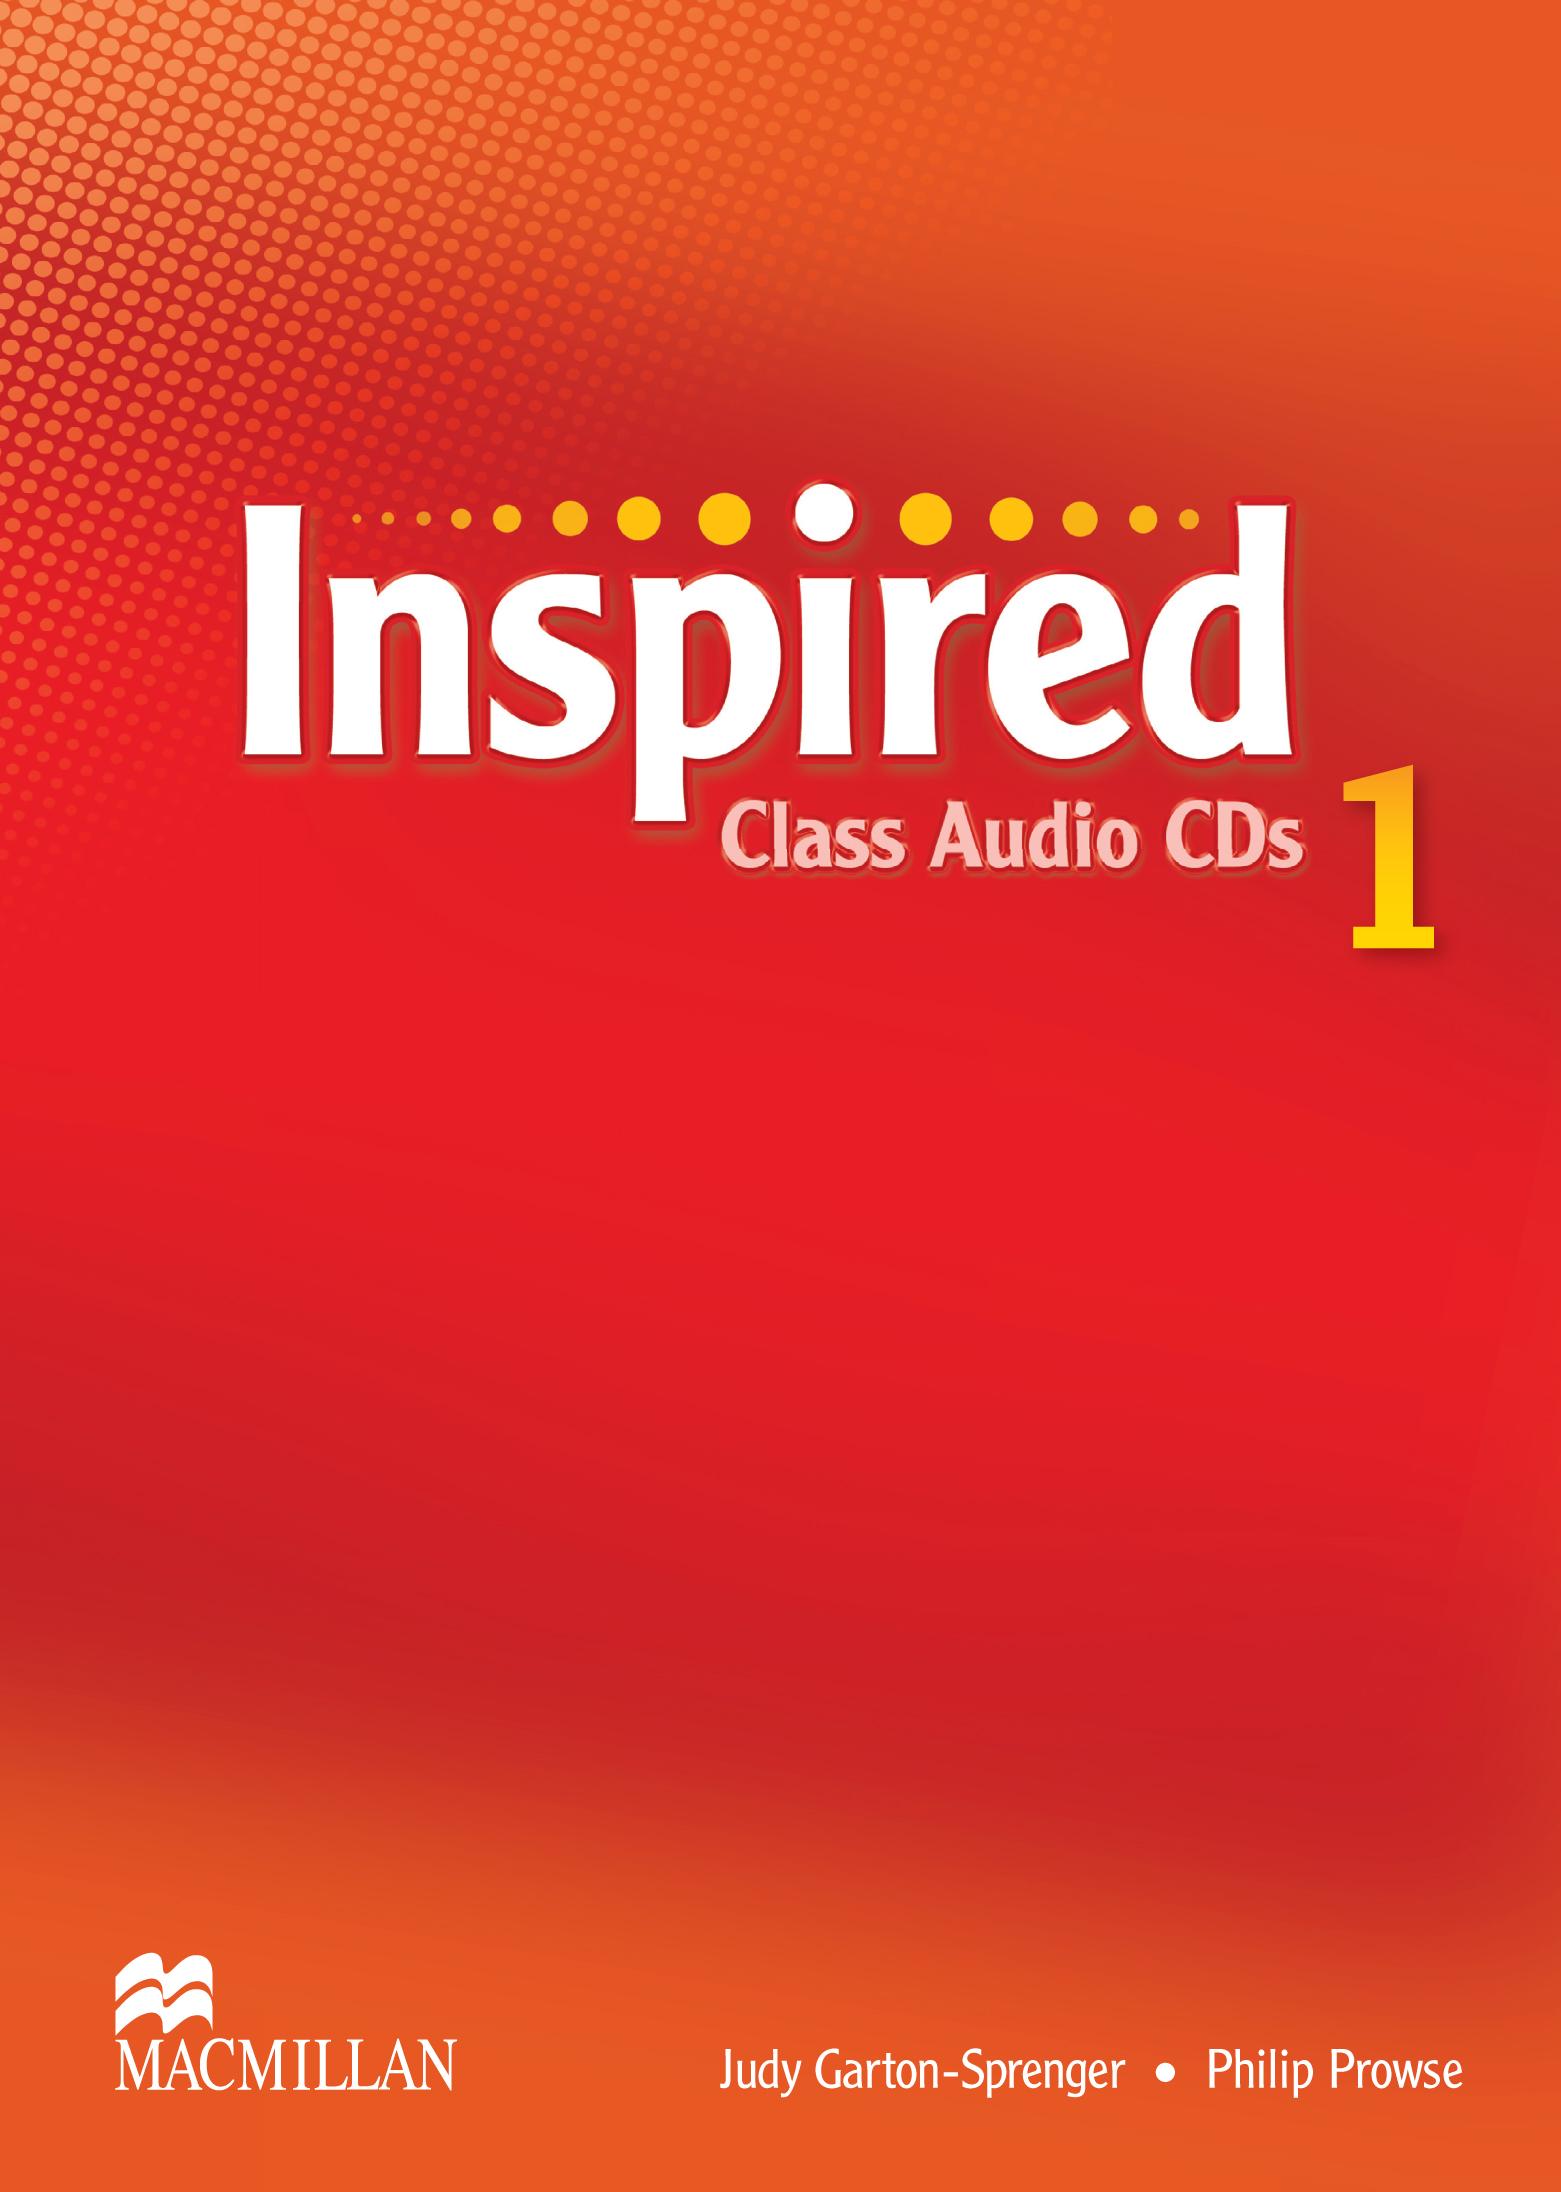 Inspired 1 Class Audio CDs